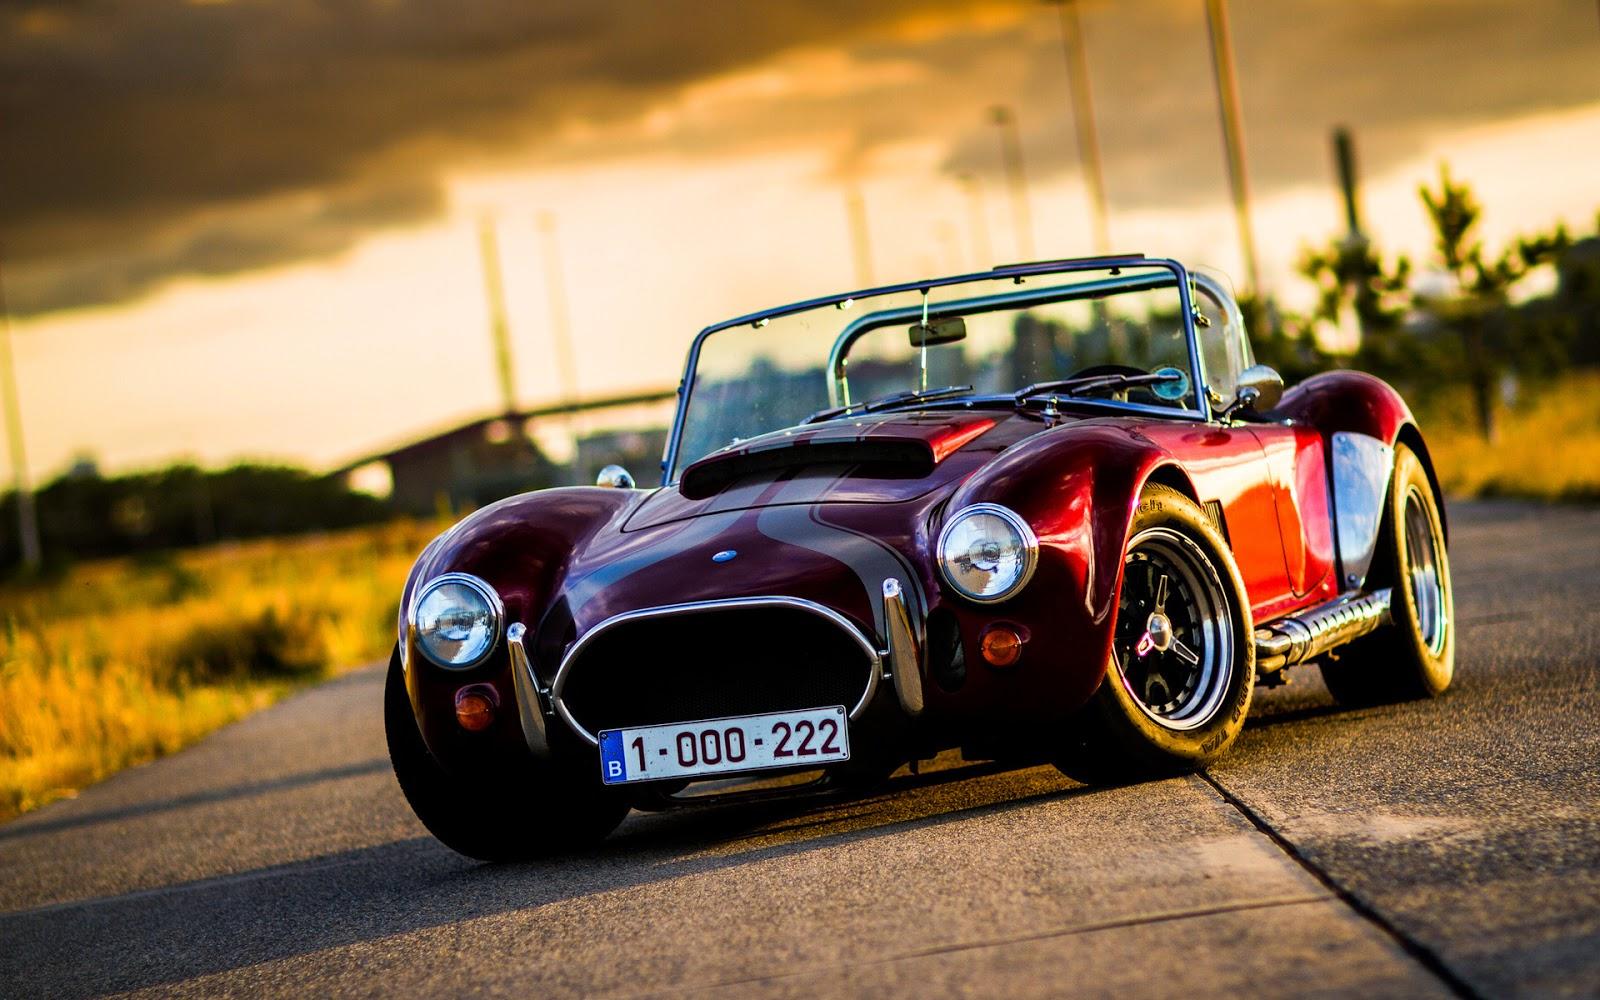 Wallpapers De Autos Hd Parte 2: Free Download 100 Amazing Car Wallpapers HD Part 2